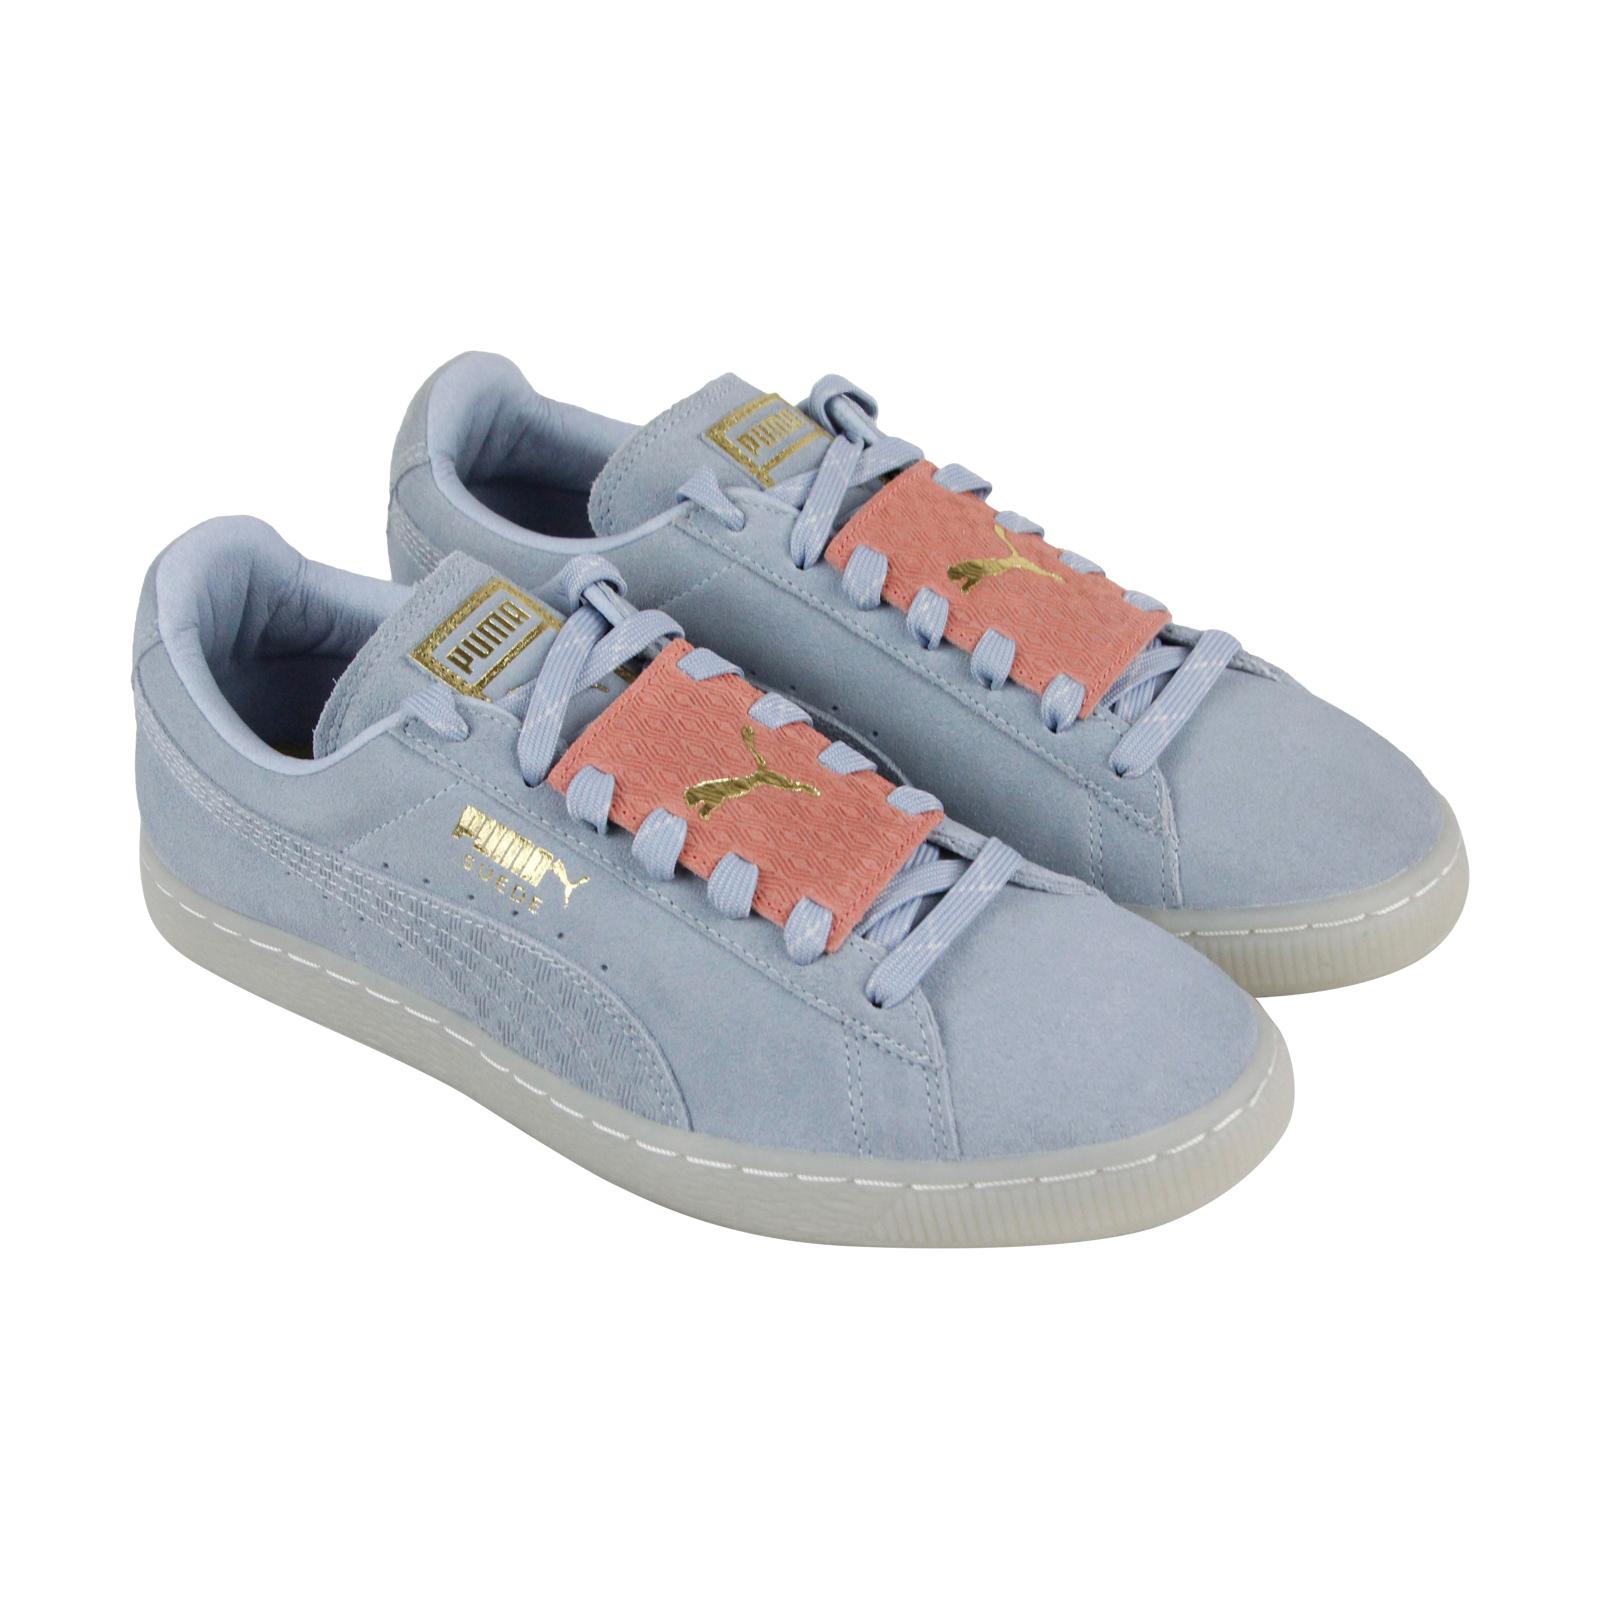 23ef9f588f1a Puma Suede Epic Remix Mens Blue Suede Lace Up Trainers Shoes